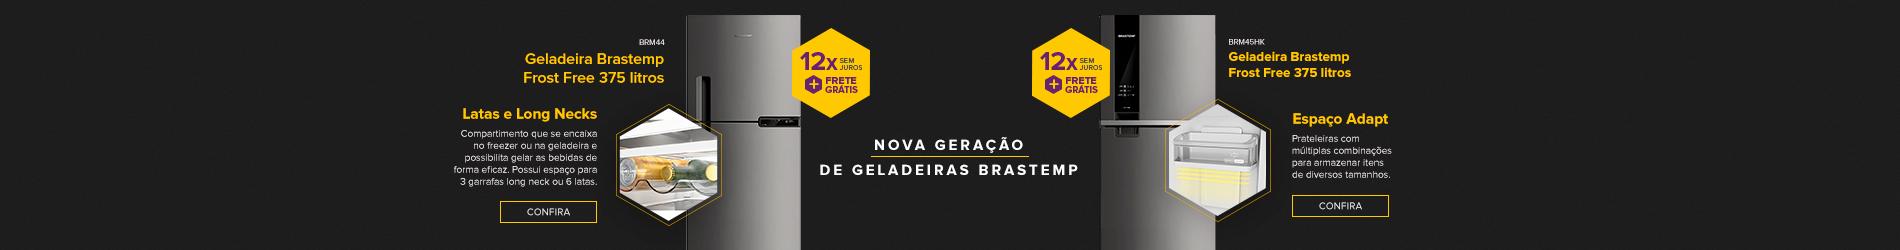 Promoção Interna - 2396 - compracerta_brm44-brm45_9042018_home7 - brm44-brm45 - 7